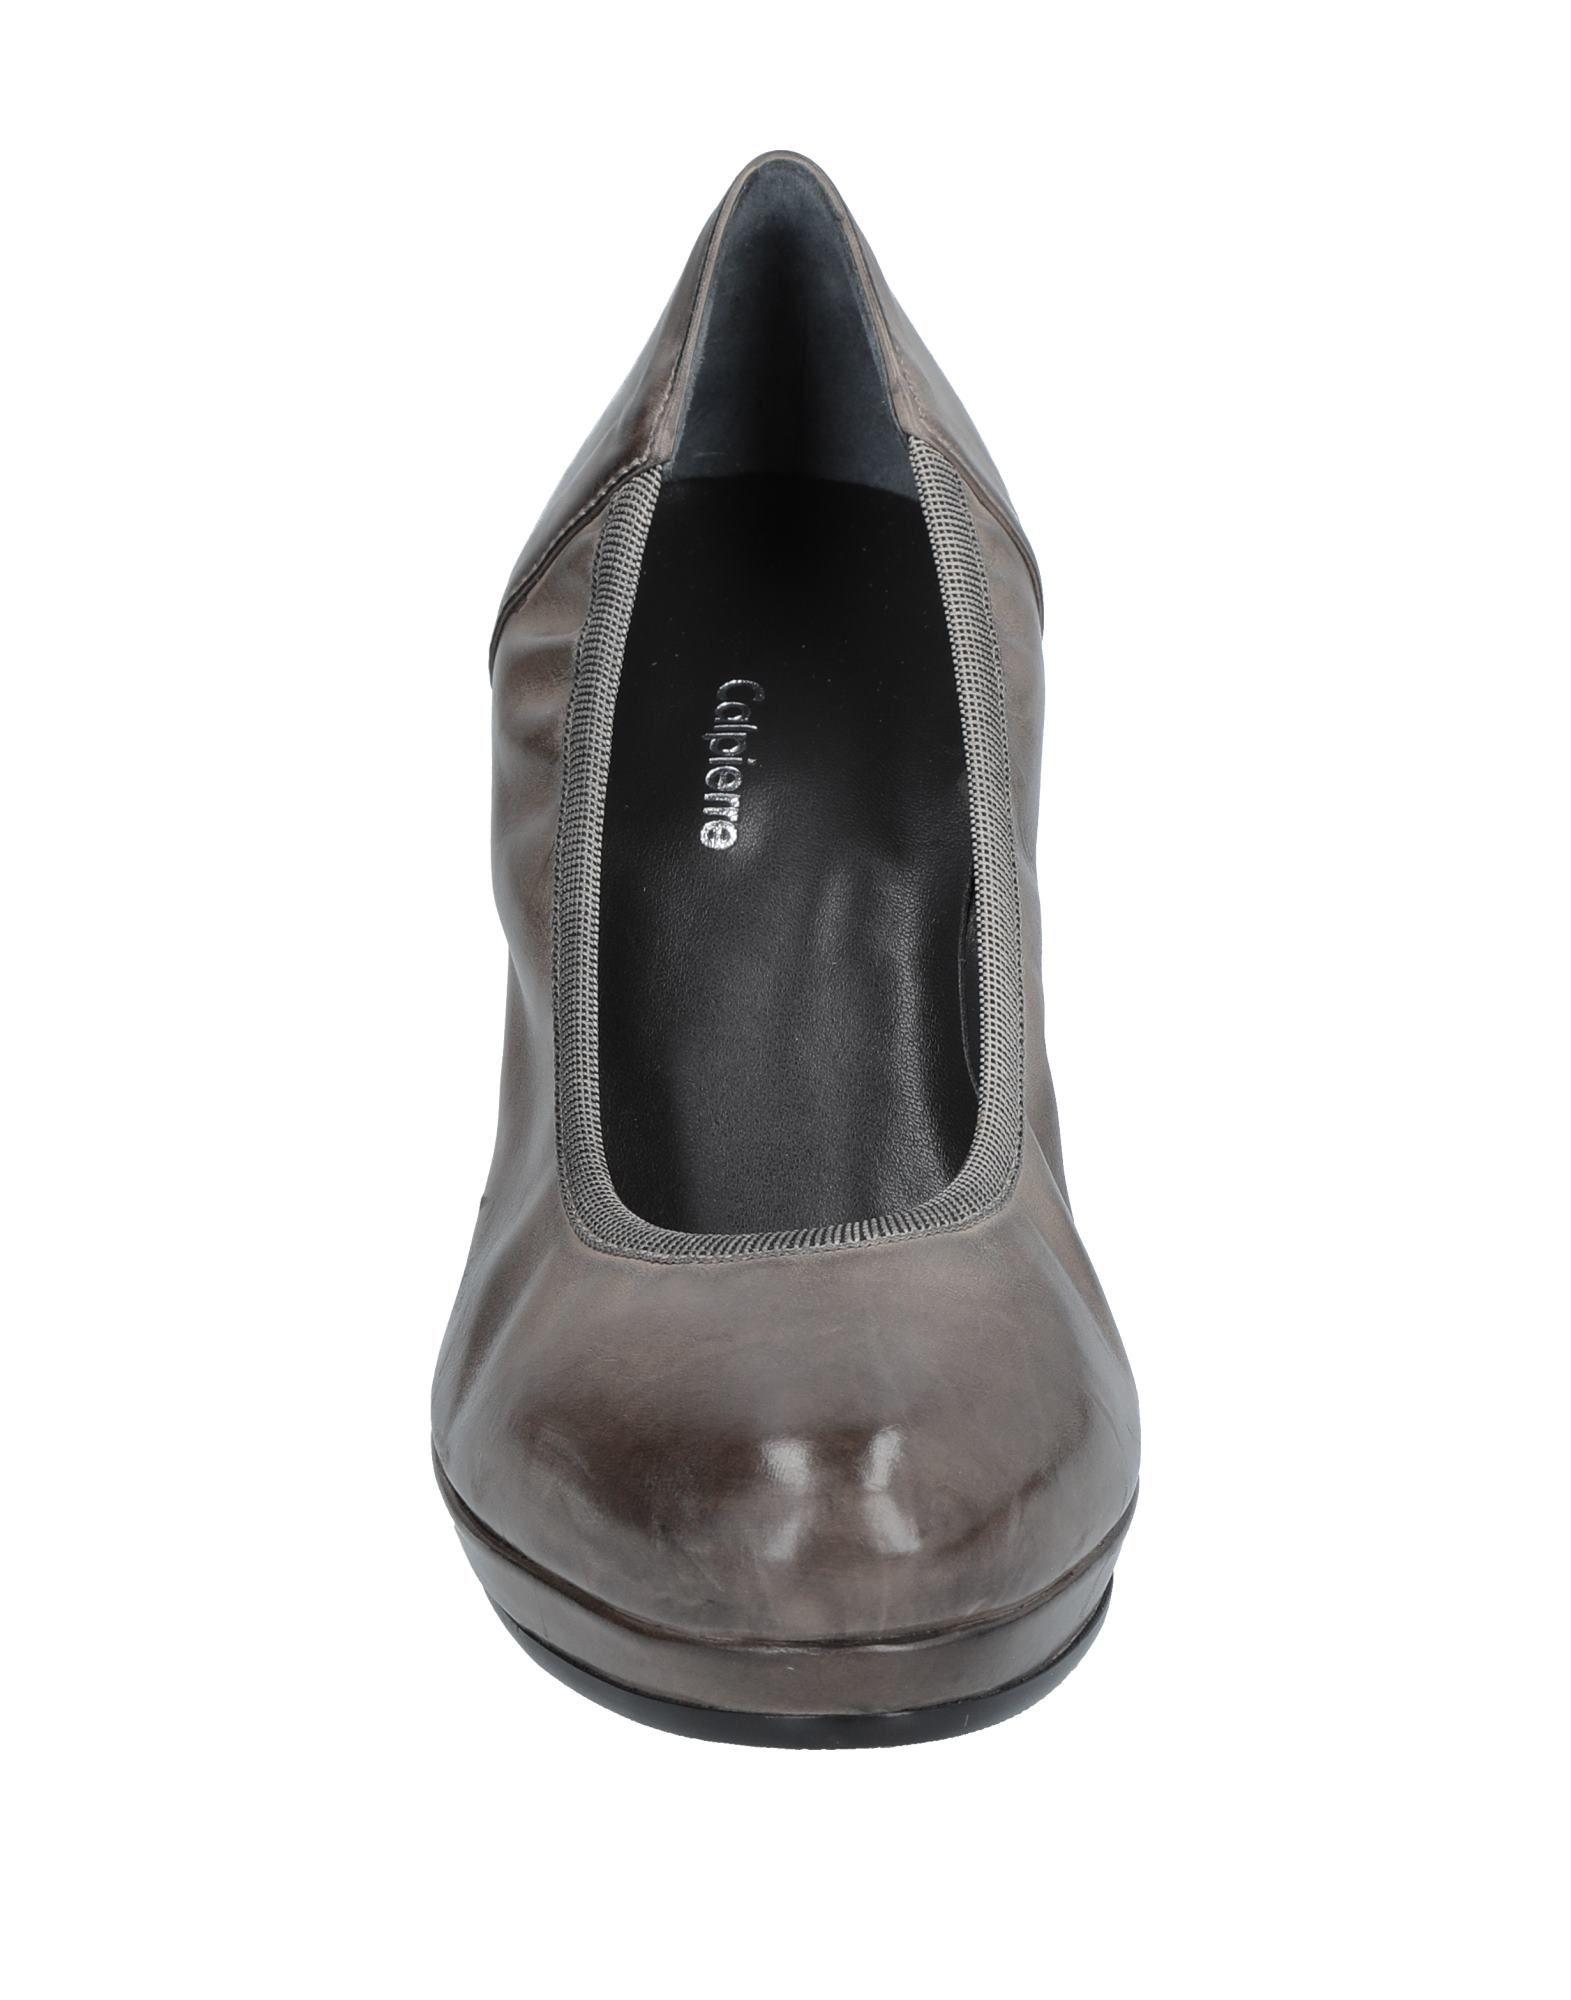 Calpierre Pumps Gute Damen  11539862UX Gute Pumps Qualität beliebte Schuhe 895114